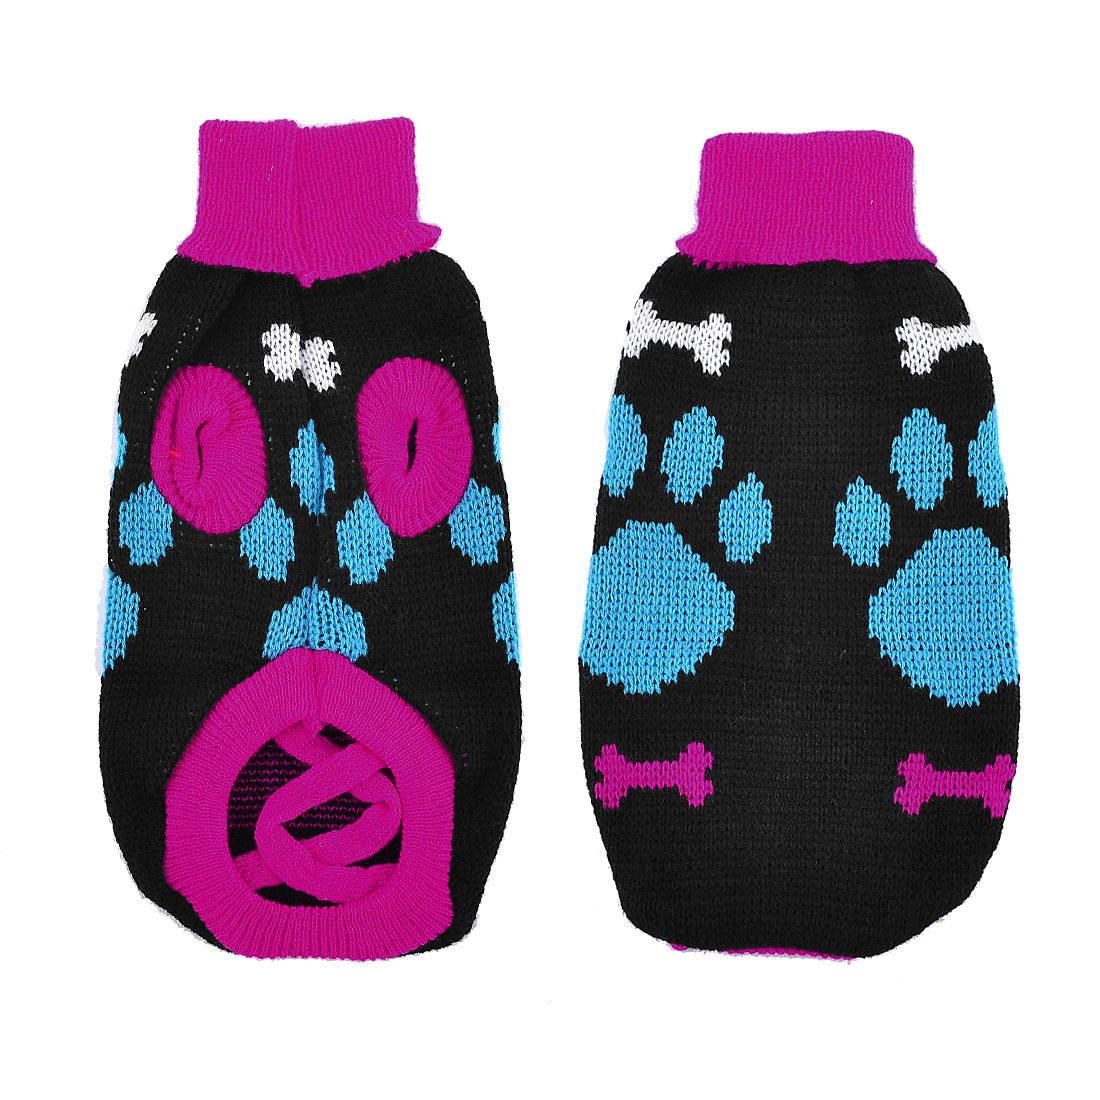 Warm Blue Fuchsia Knitting Turtleneck Paw Print Pet Dog Sweater Coat Size XS